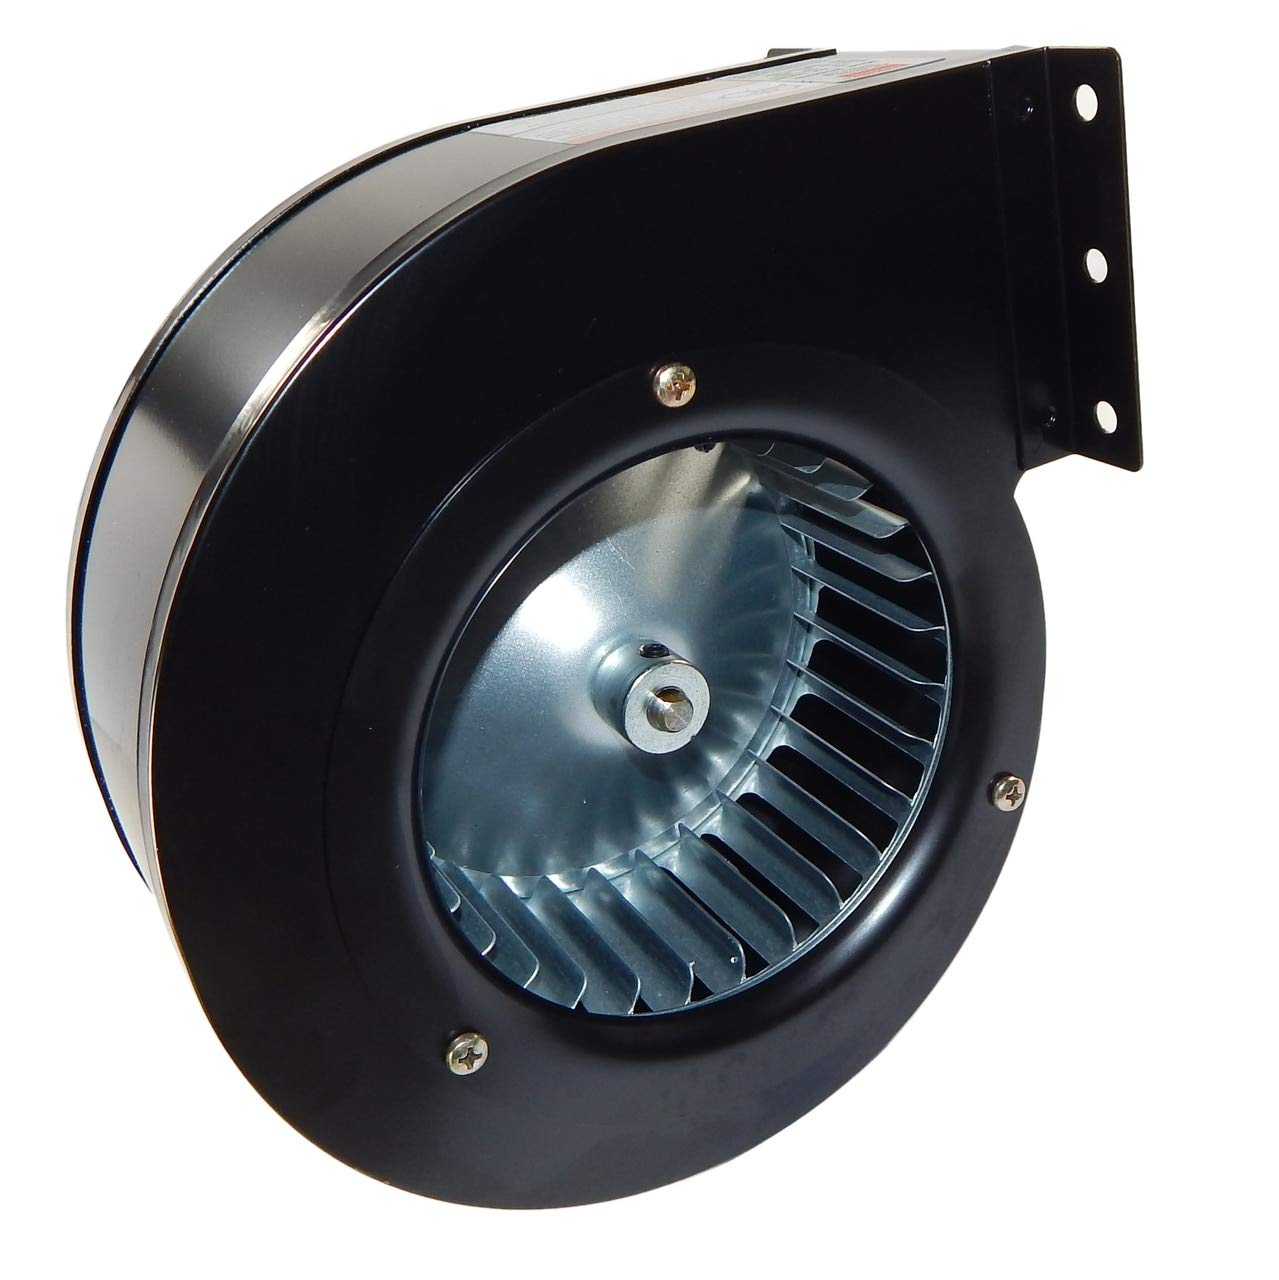 Dayton 2c647 Rectangular Permanent Split Capacitor Oem Specialty Motors Home Page Blower Electric Fan Industrial Scientific